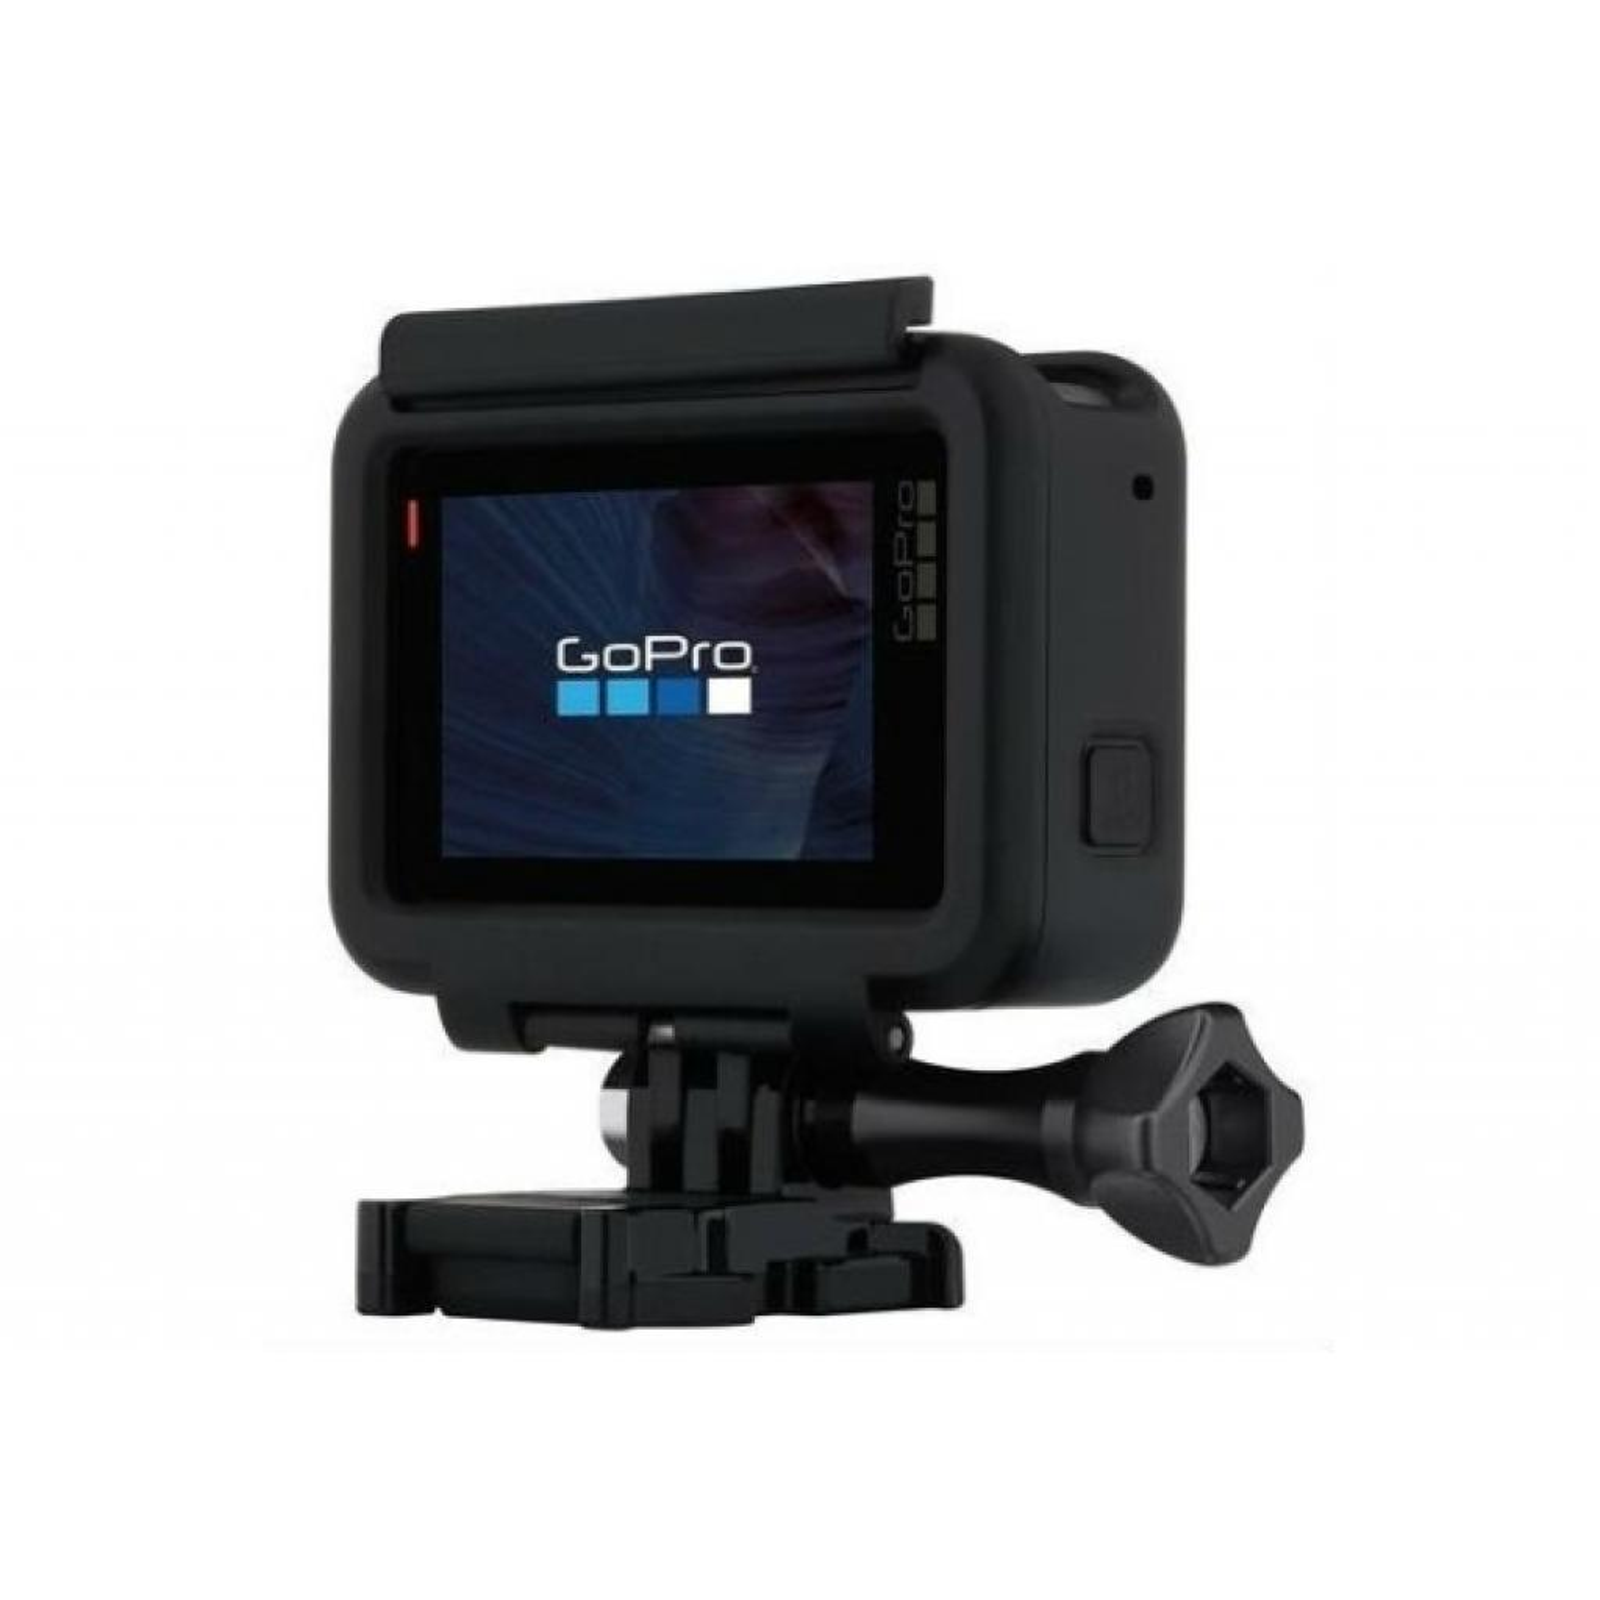 Аксессуар к экшн-камерам GoPro The Frame (AAFRM-001) изображение 4